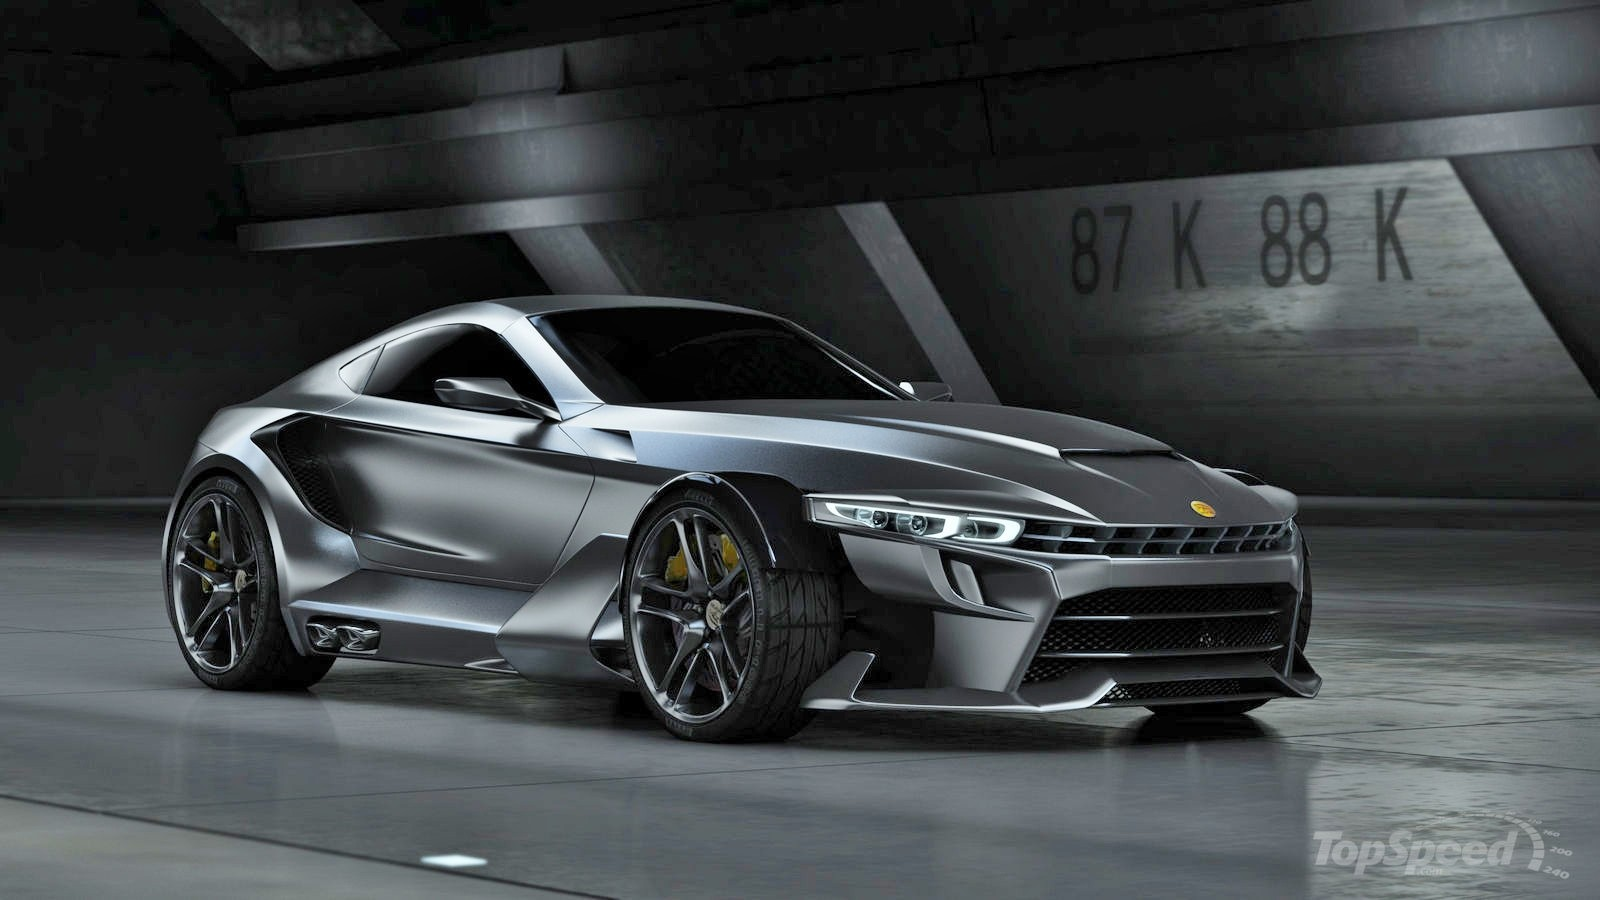 2015 IFR Automotive aspid gt 21 Invictus